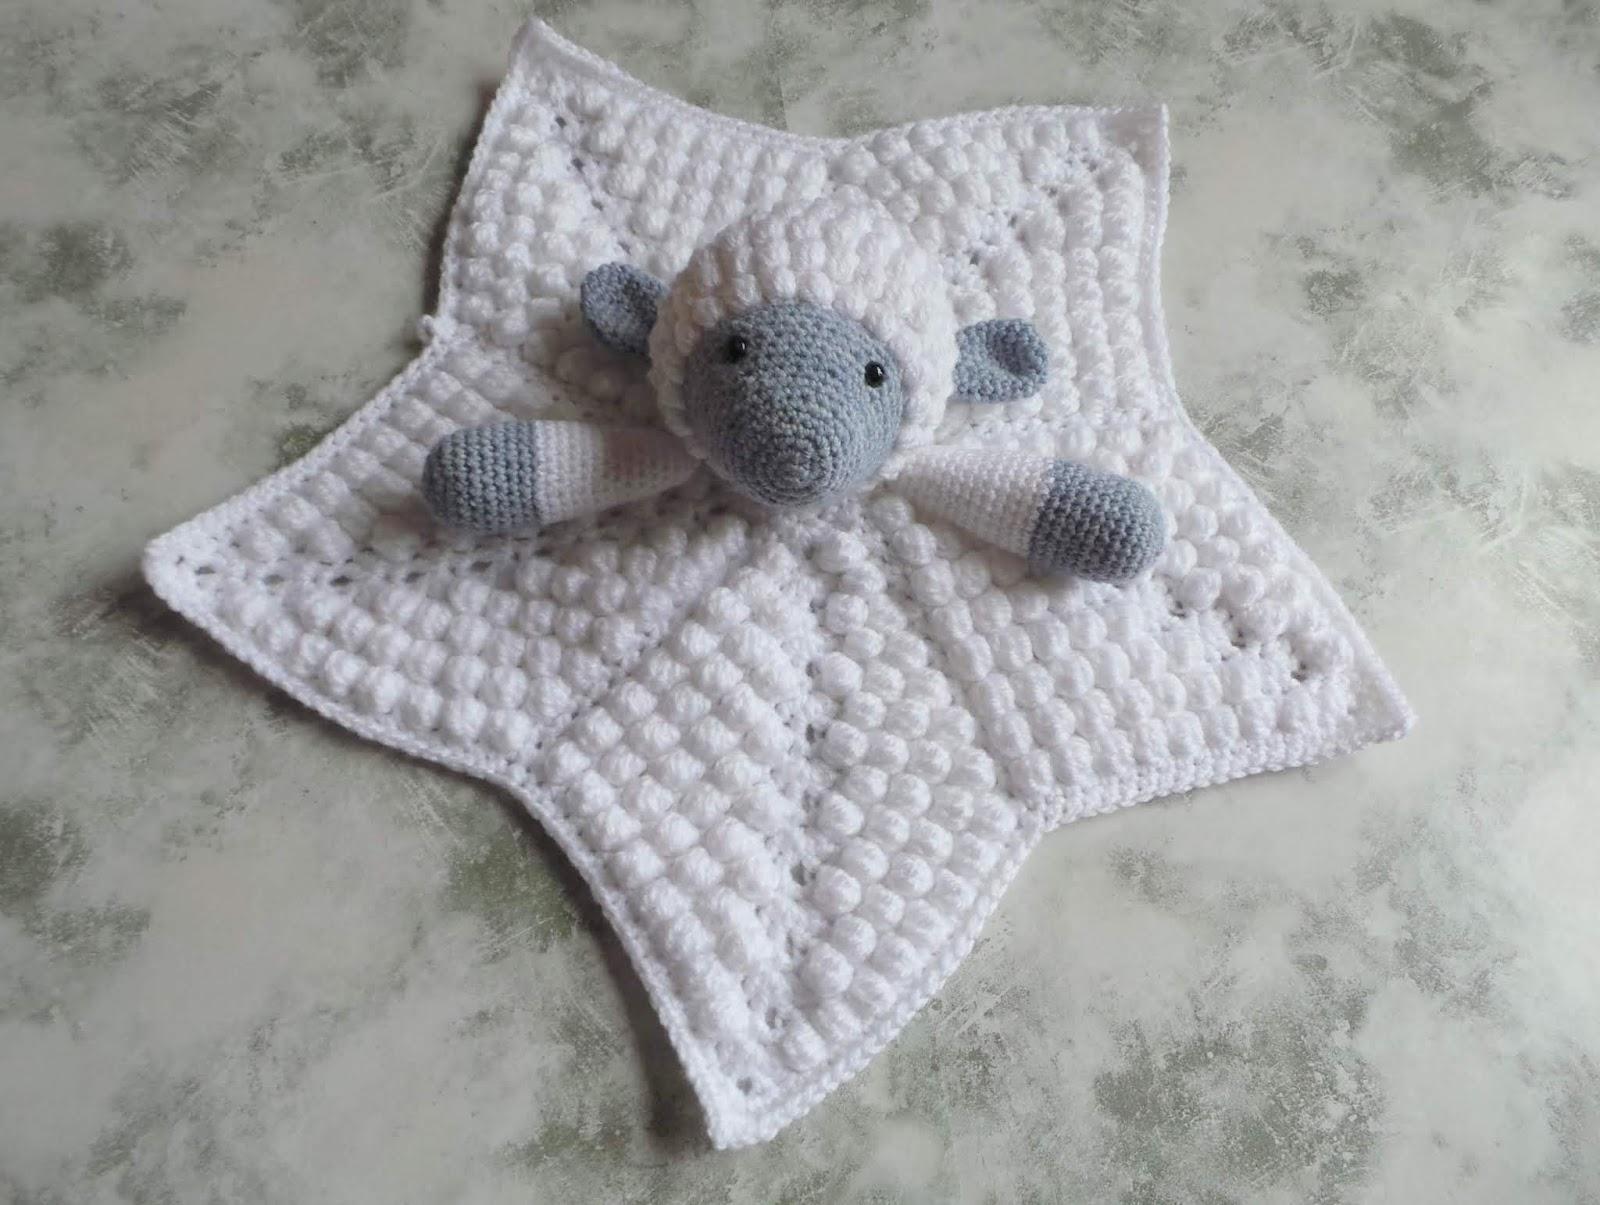 Crochet Tutorial Bobble Stitch 5 Point Star Free Crochet Pattern